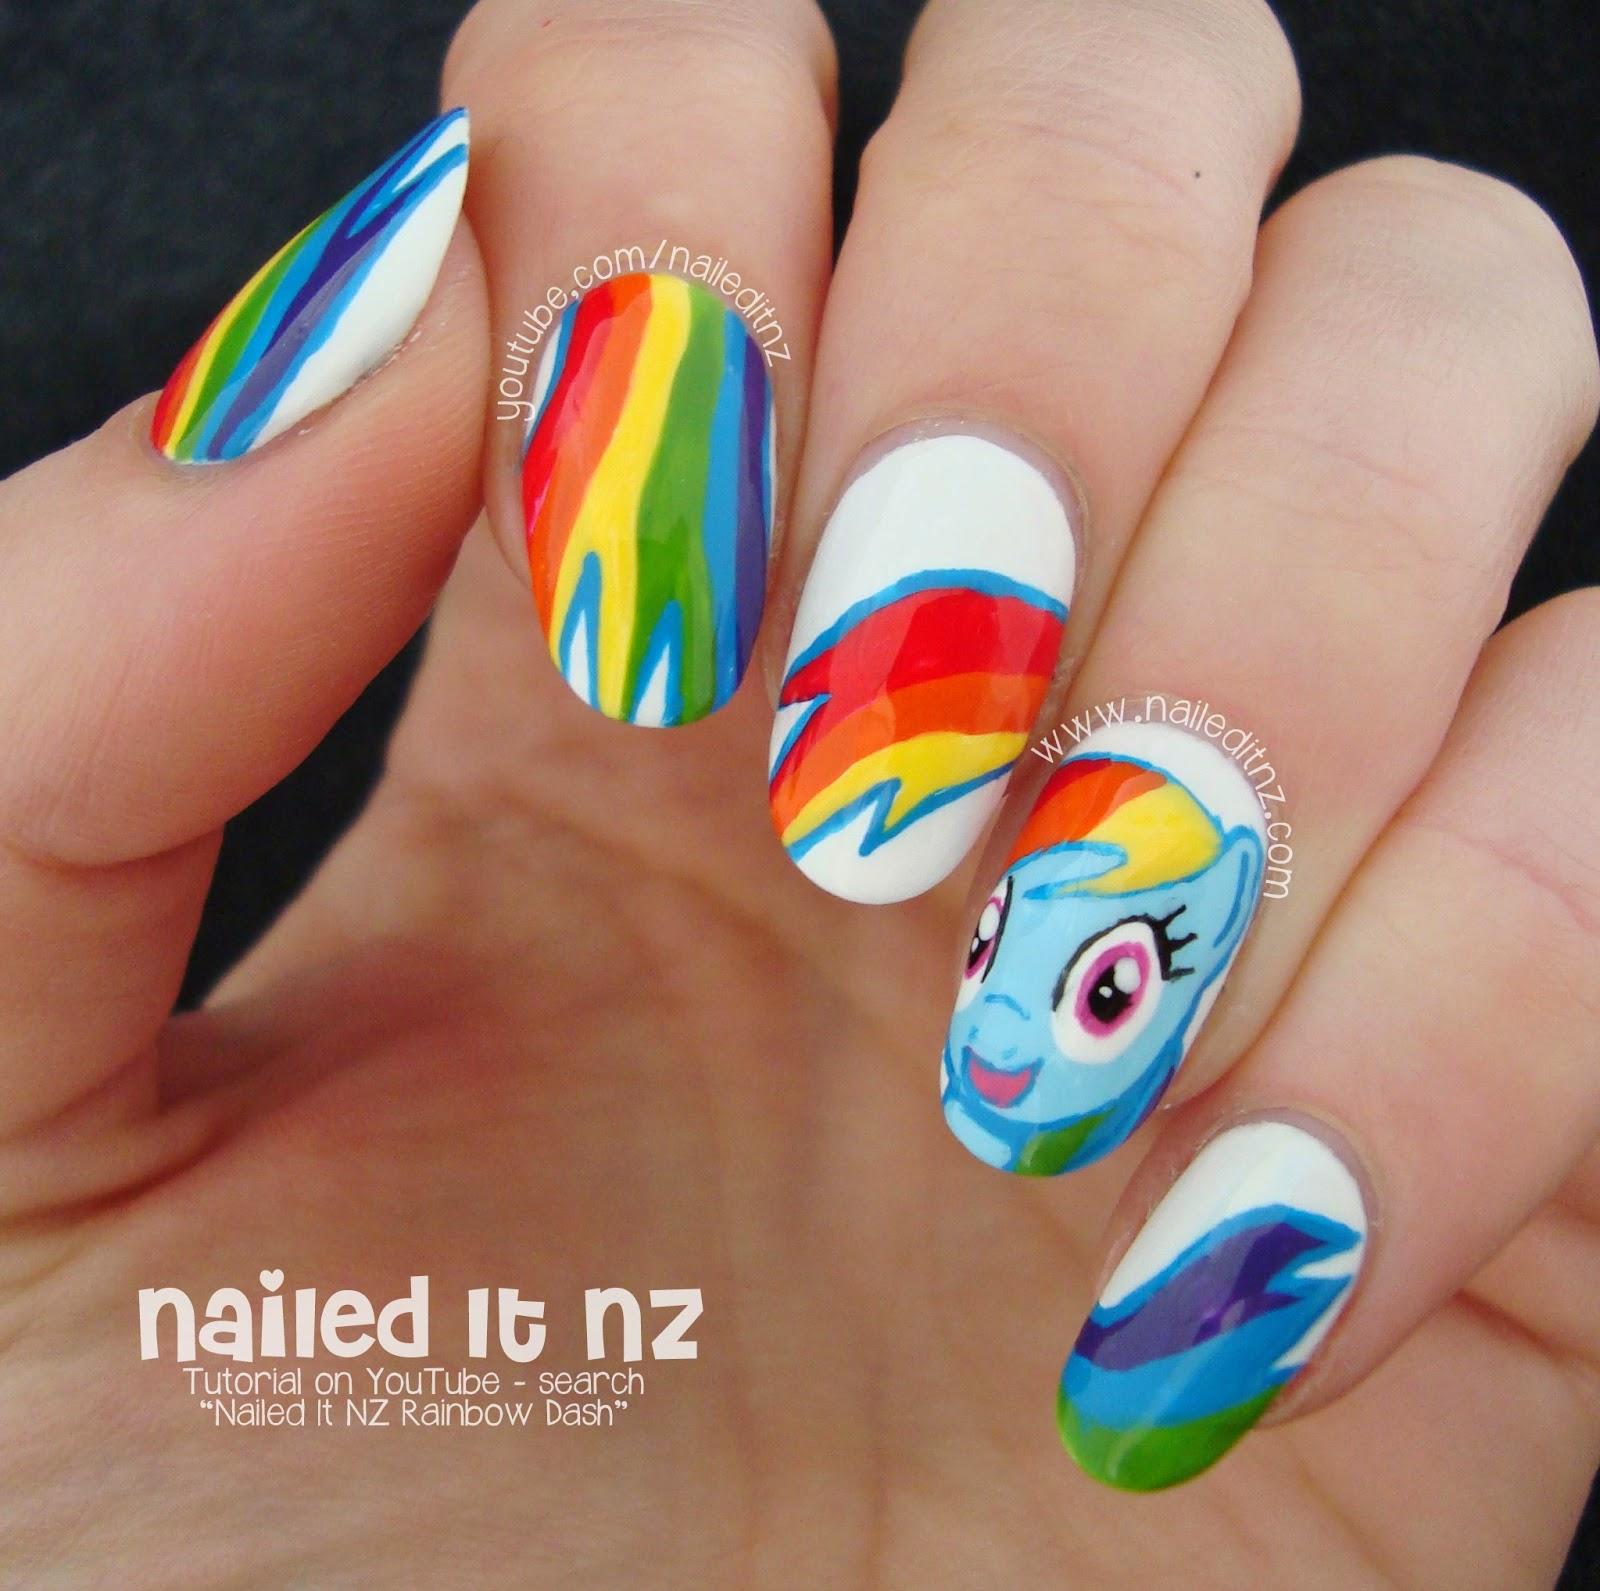 Rainbow Dash Nail Designs | www.pixshark.com - Images ...